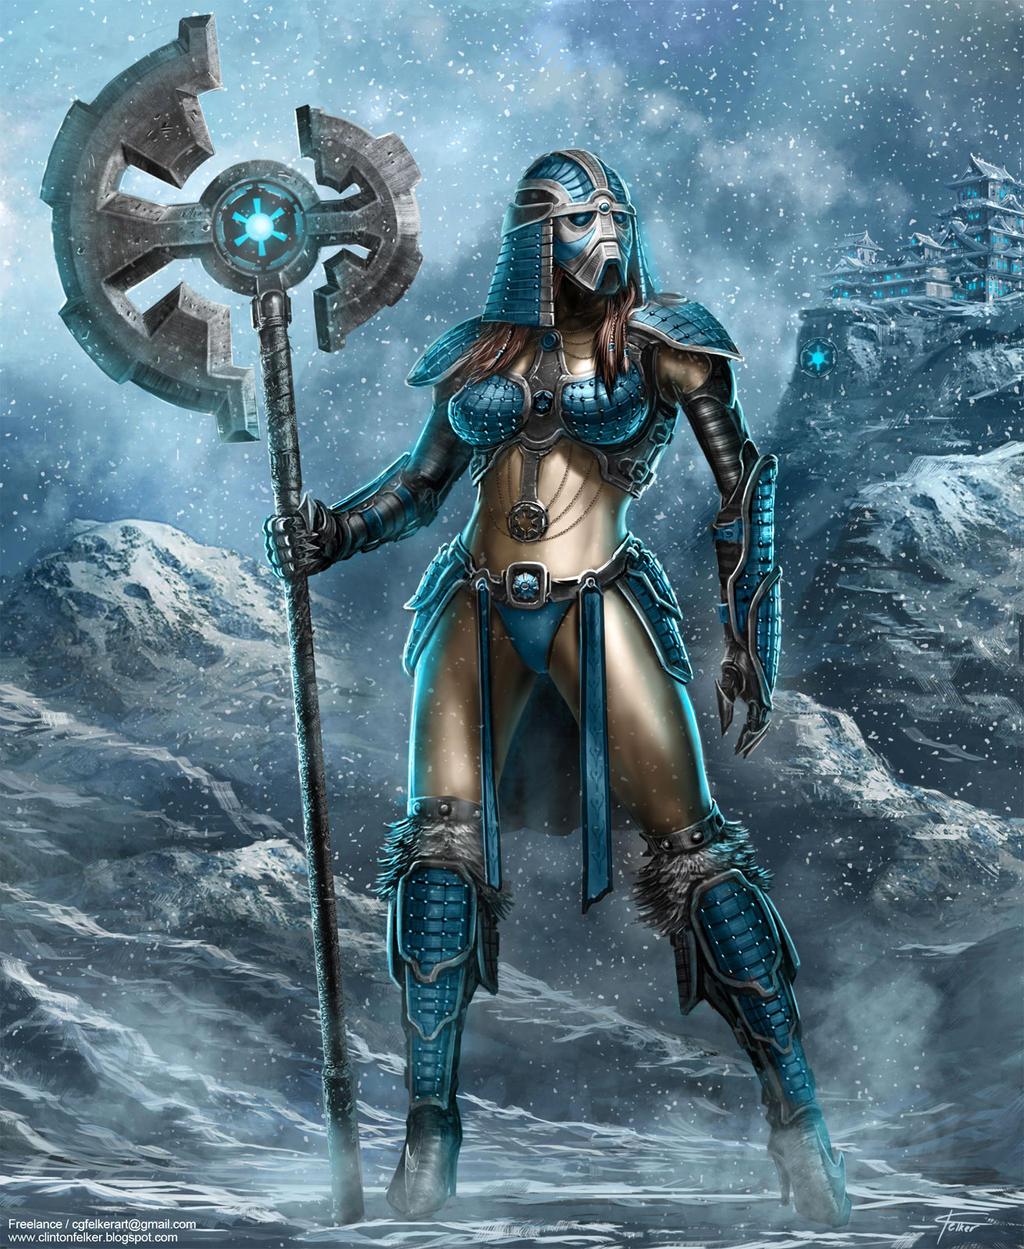 Samurai SW female armor concept by cgfelker